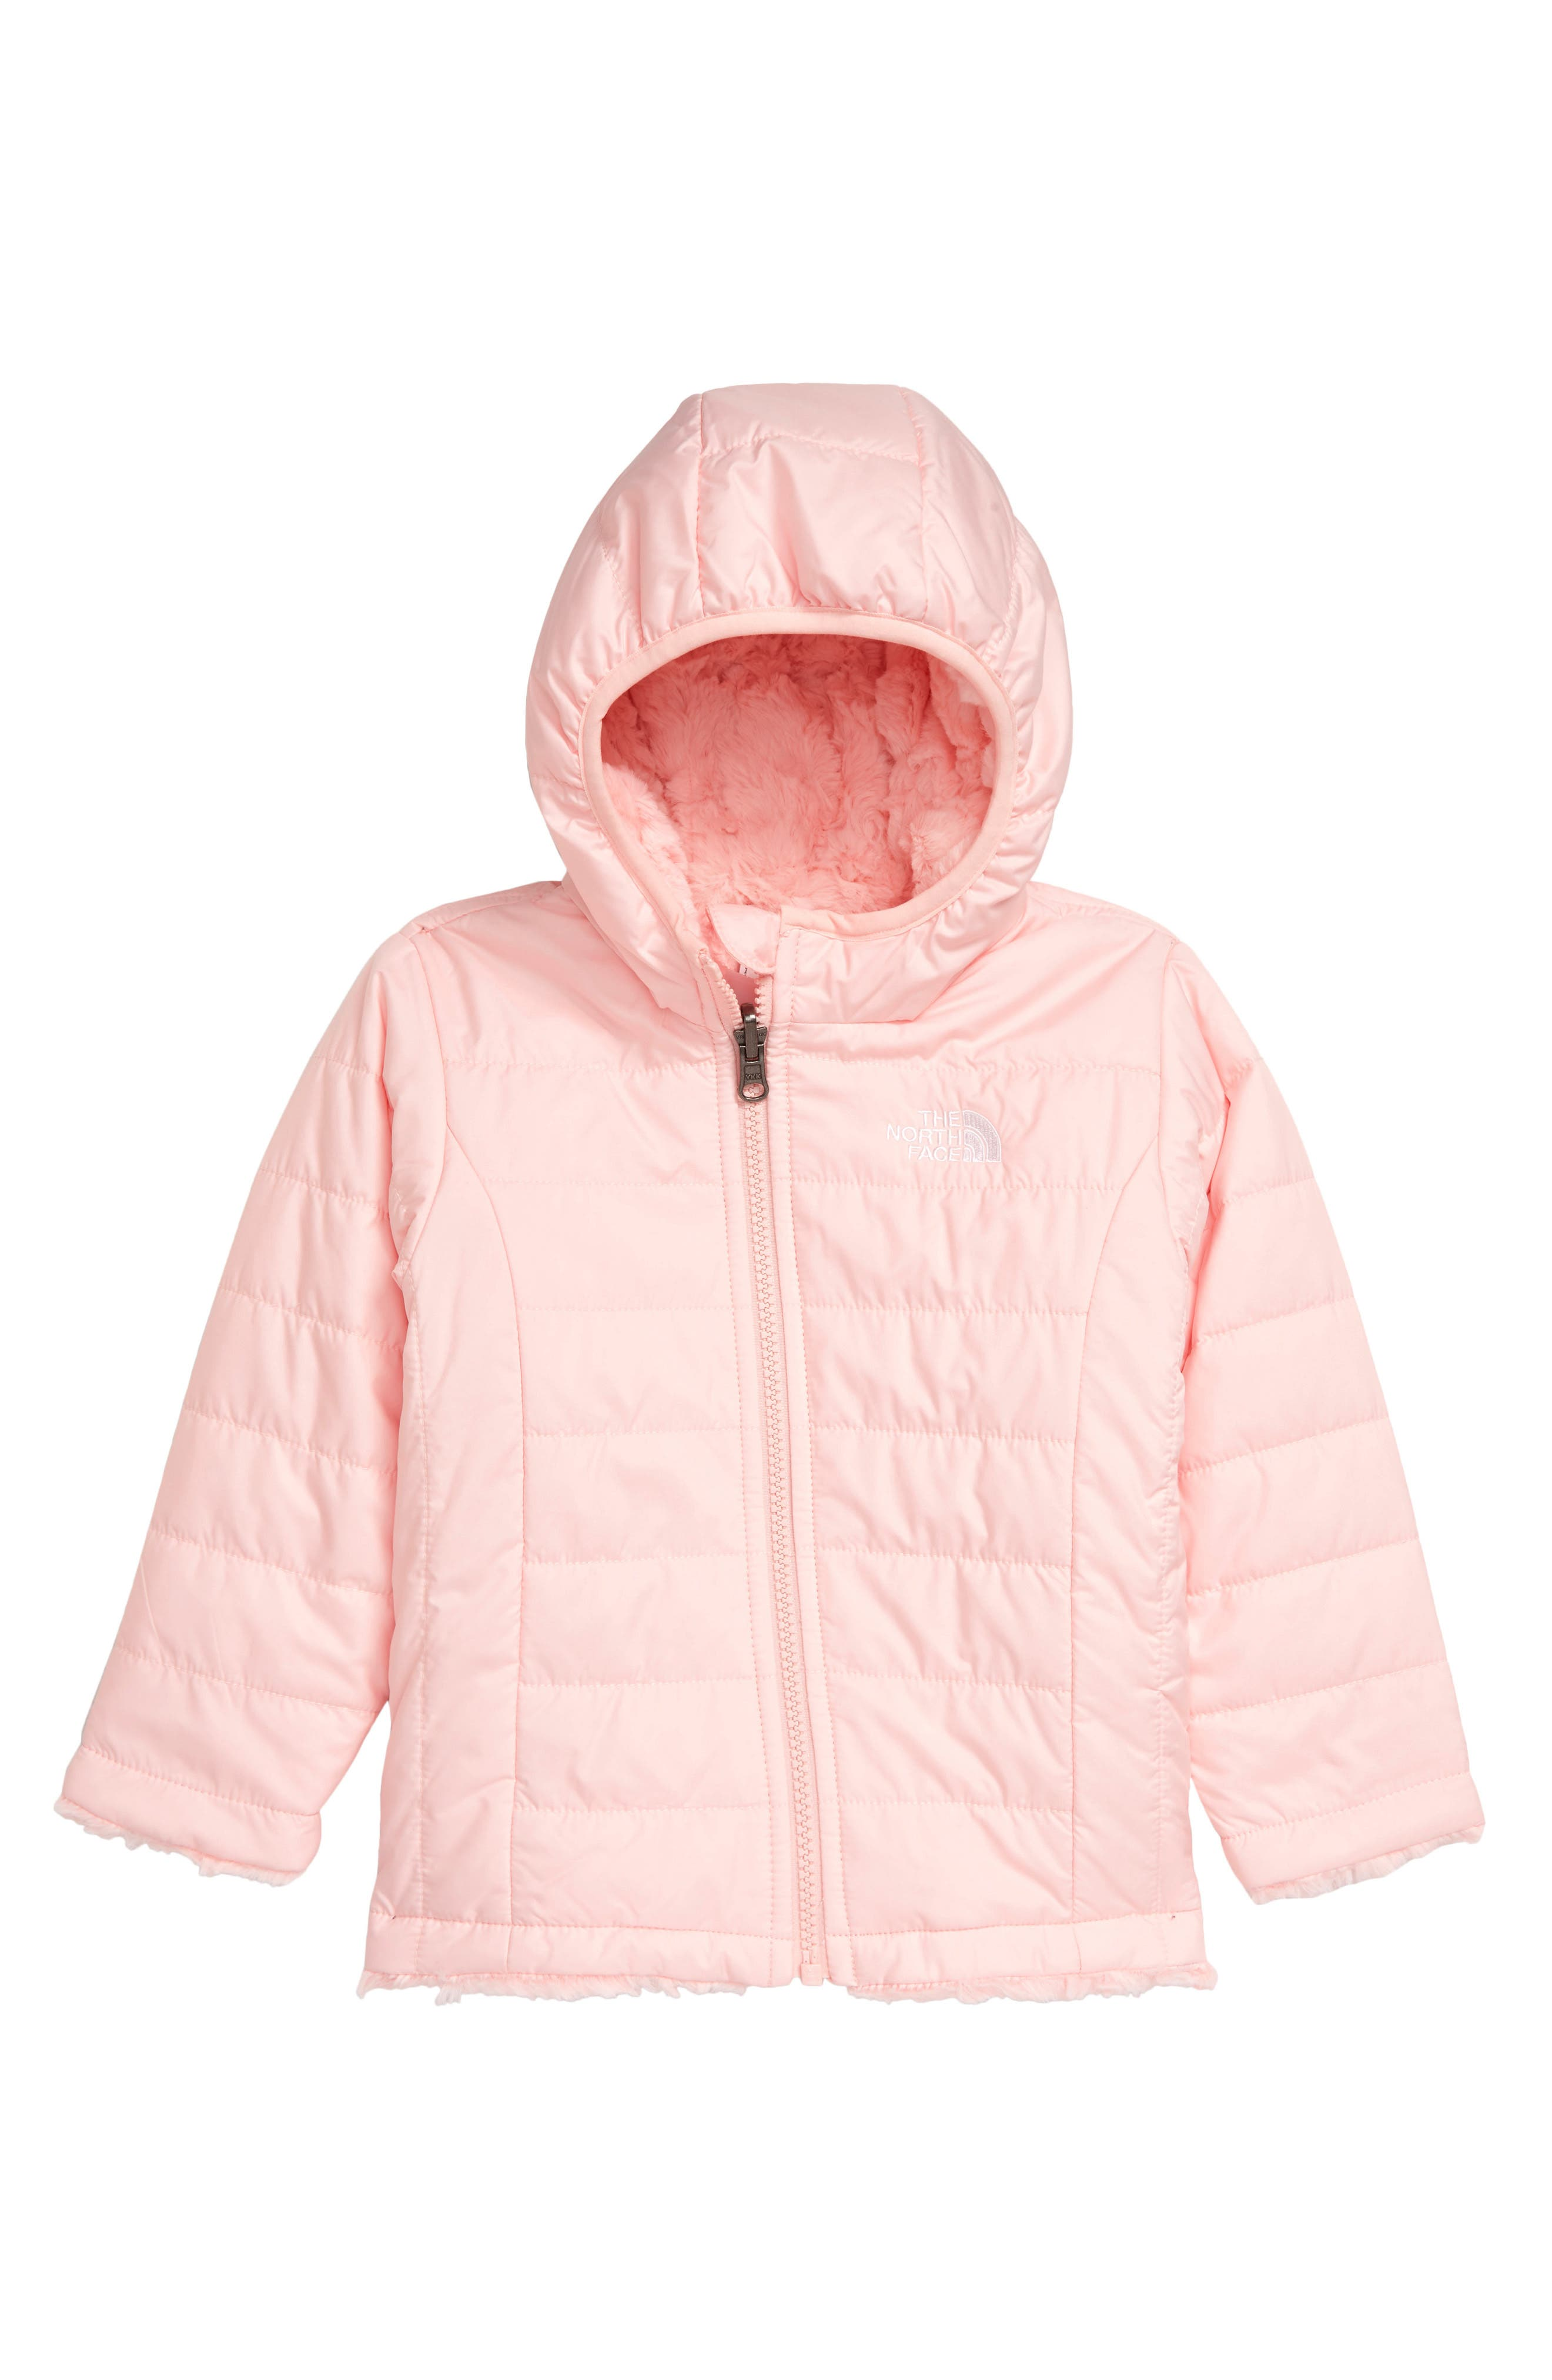 Infant Newborn Girls Outerwear Hooded Coat Cotton Jacket Kids Girls Clothes